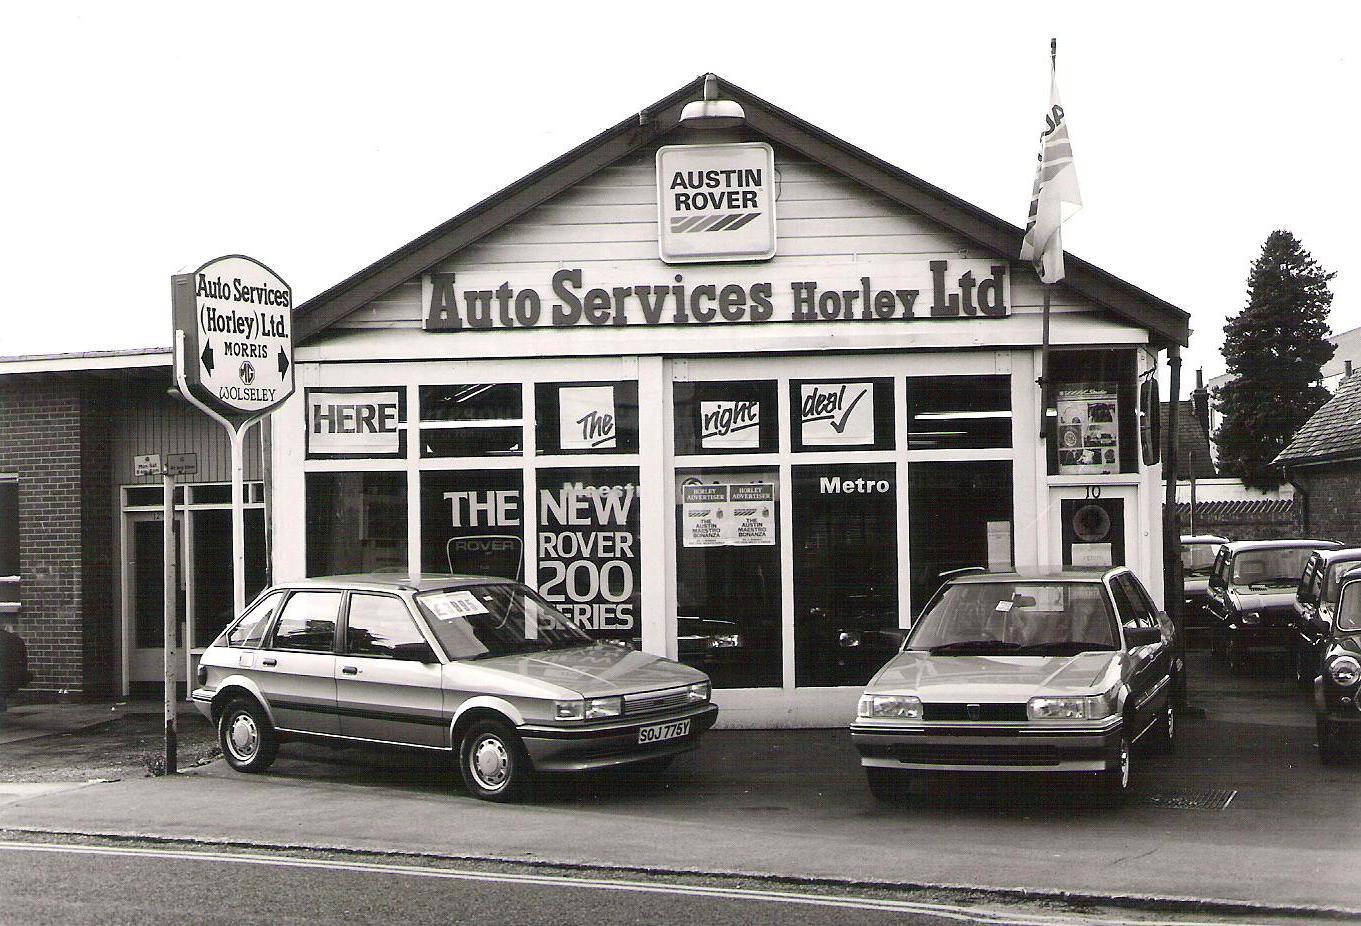 massetts rd  10  1984.00  auto services horley ltd